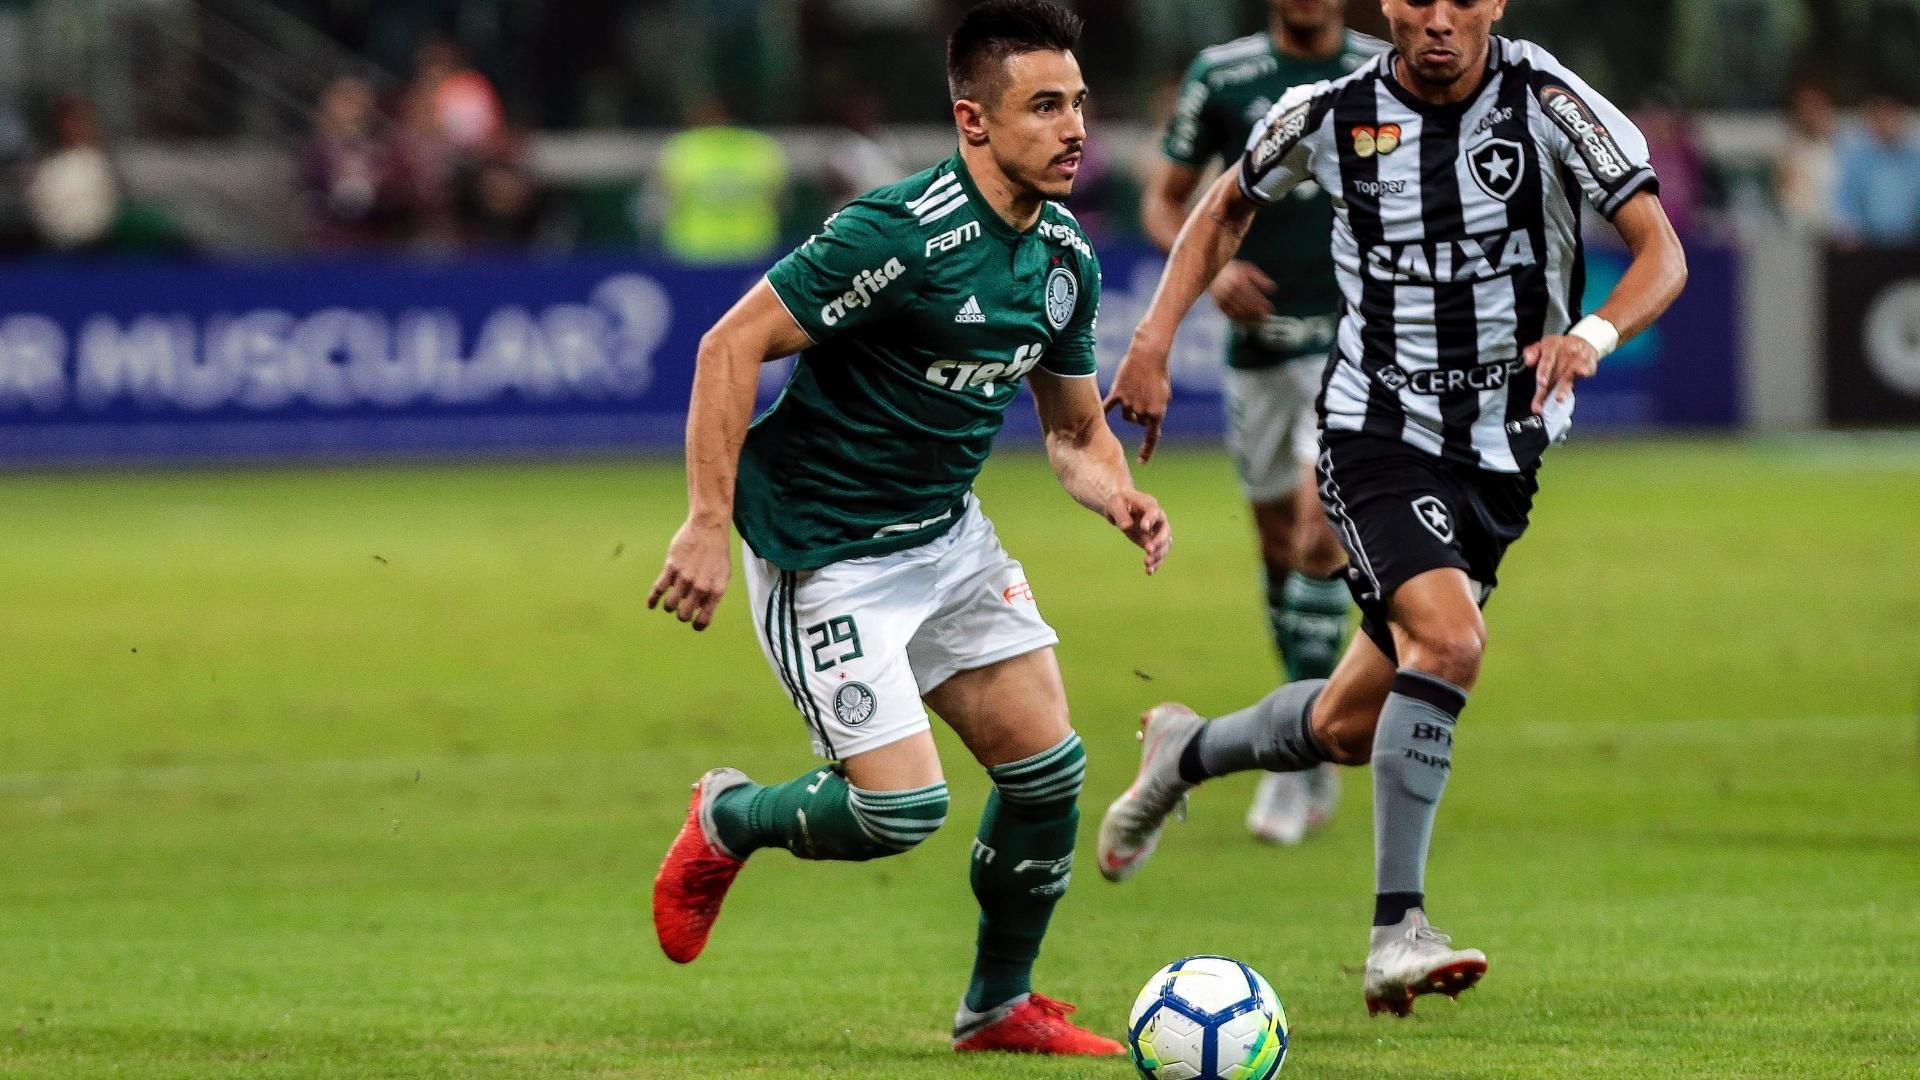 O atacante Willian em lance da partida entre Palmeiras e Botafogo